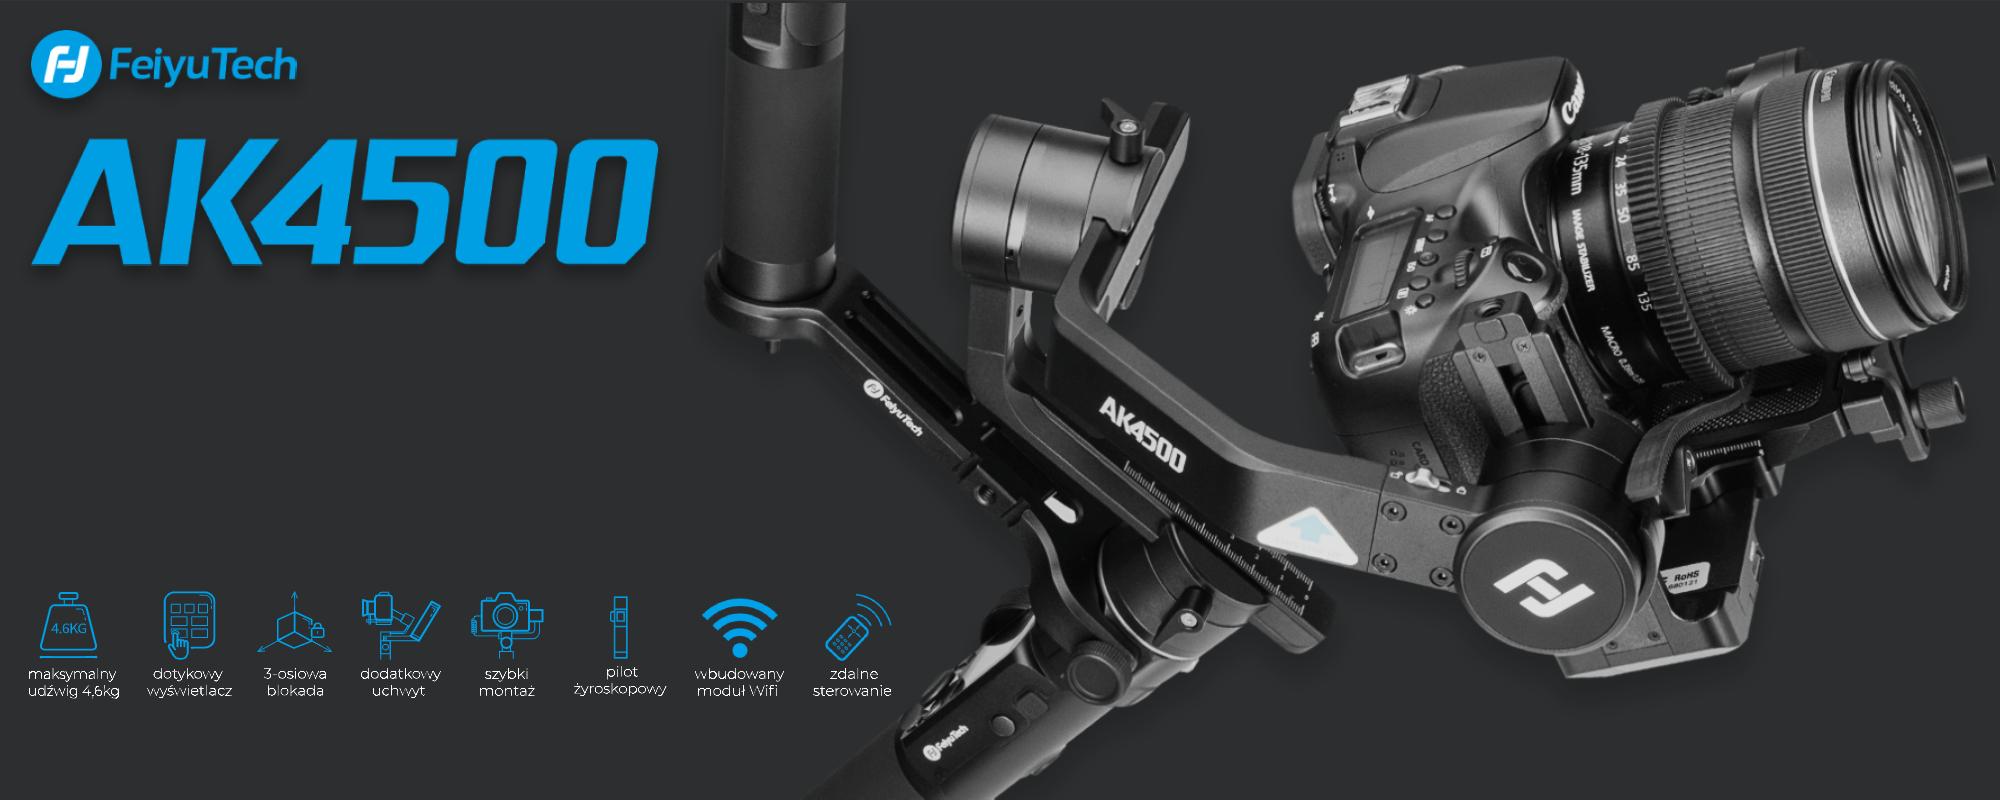 Grafika - Gimbal ręczny FeiyuTech AK4500 Standard Kit do aparatółw VDSLR i kamer_01.jpg